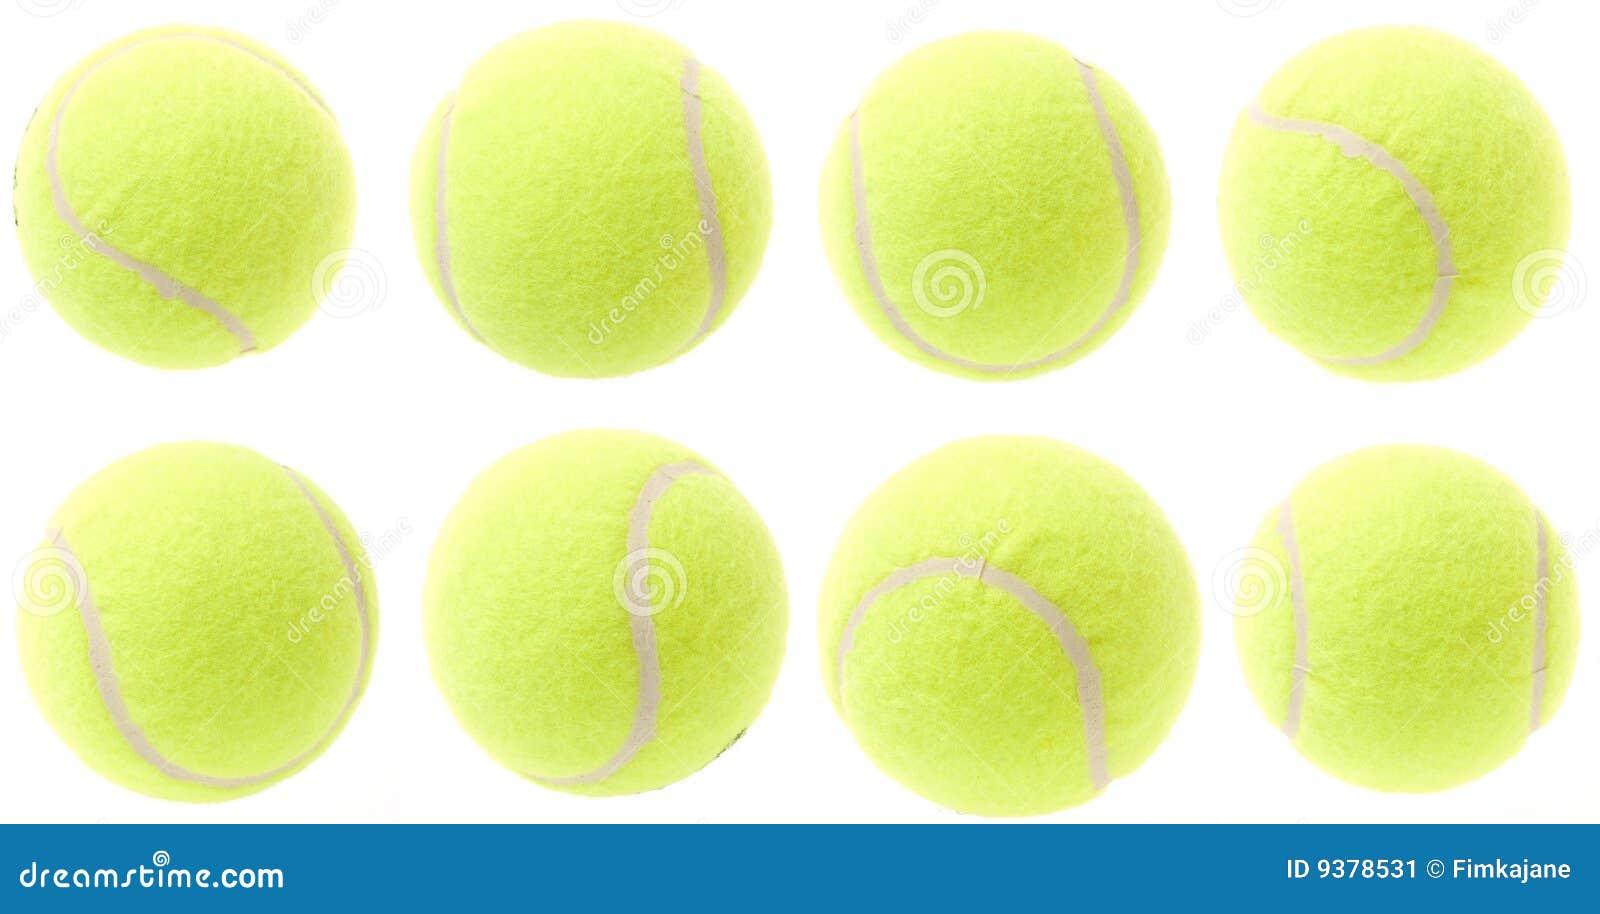 Tennis Balls Stock Image Image Of Ball Border Green 9378531